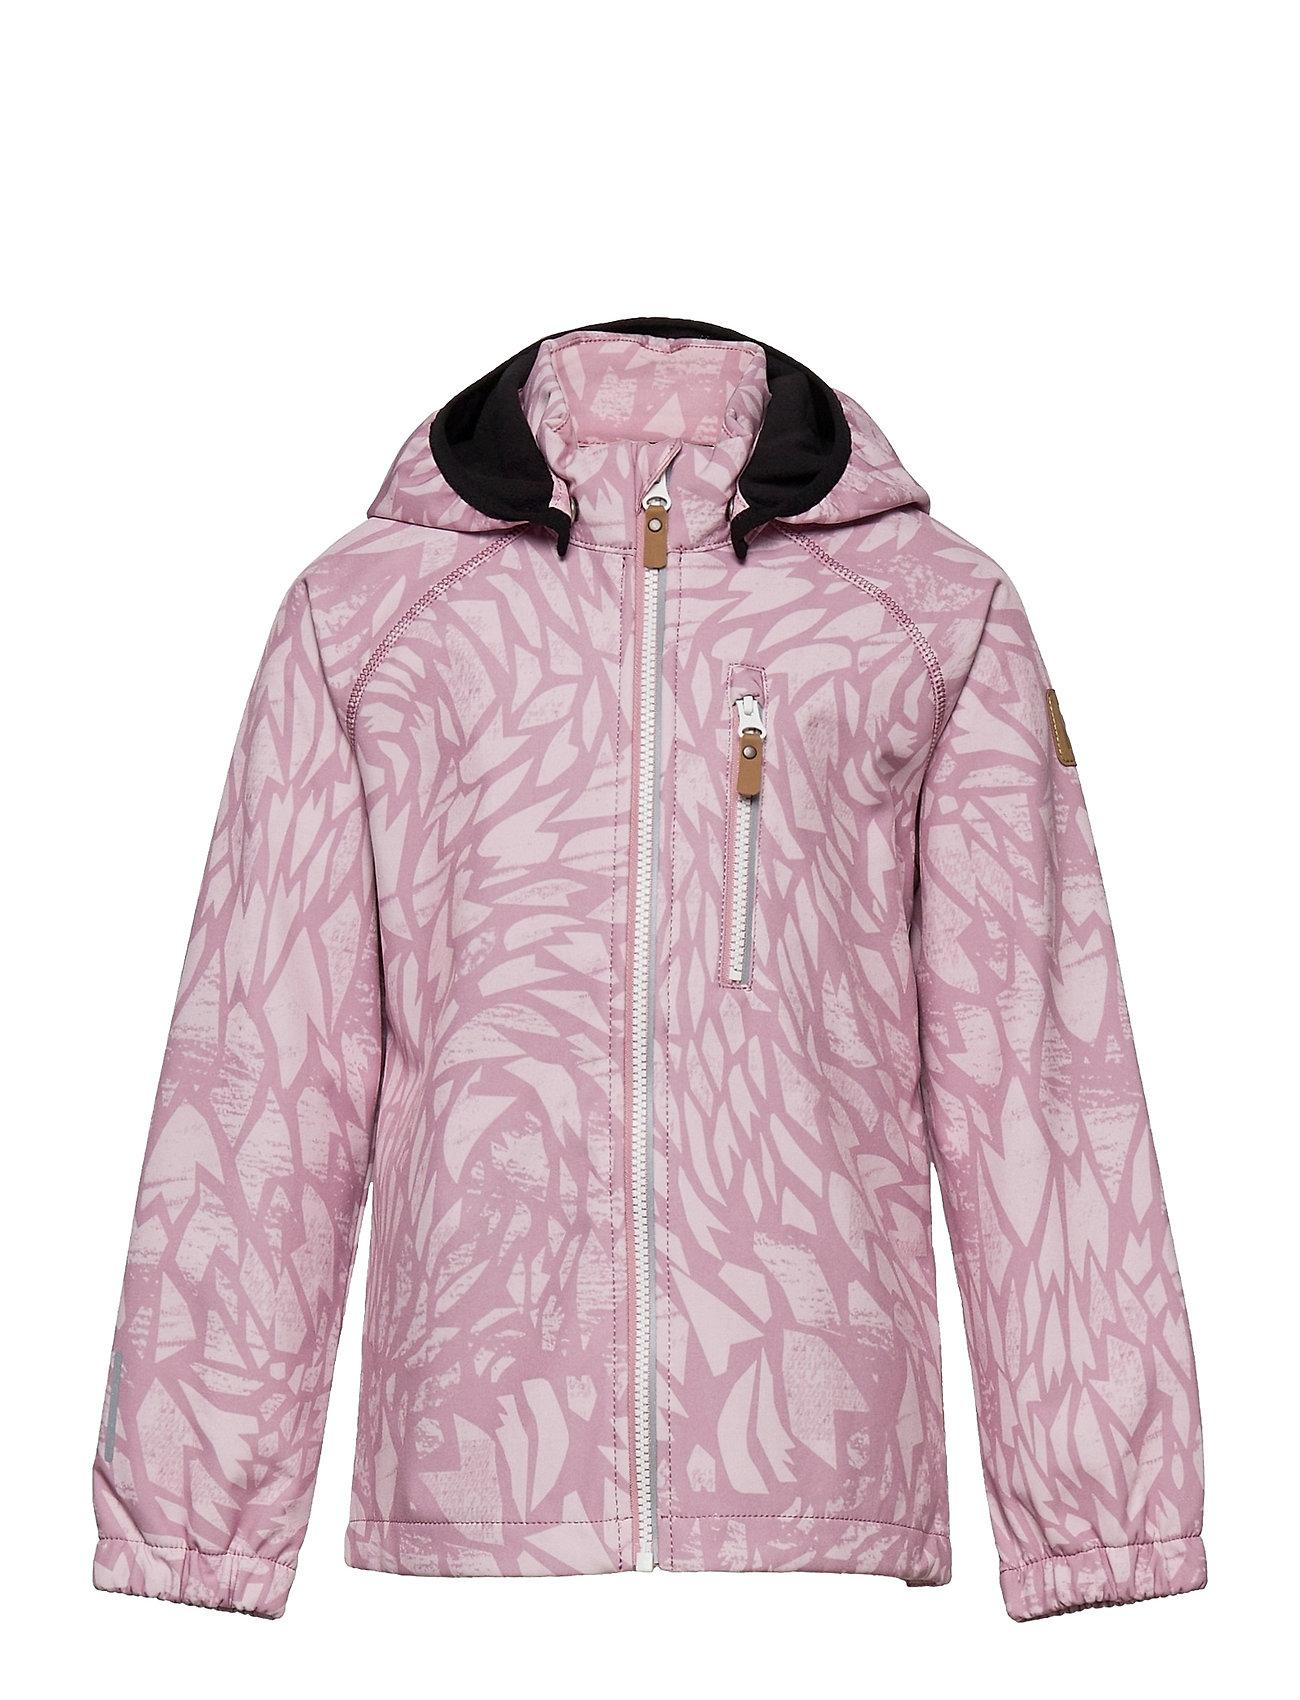 Vantti Outerwear Softshells Softshell Jackets Lyserød Reima